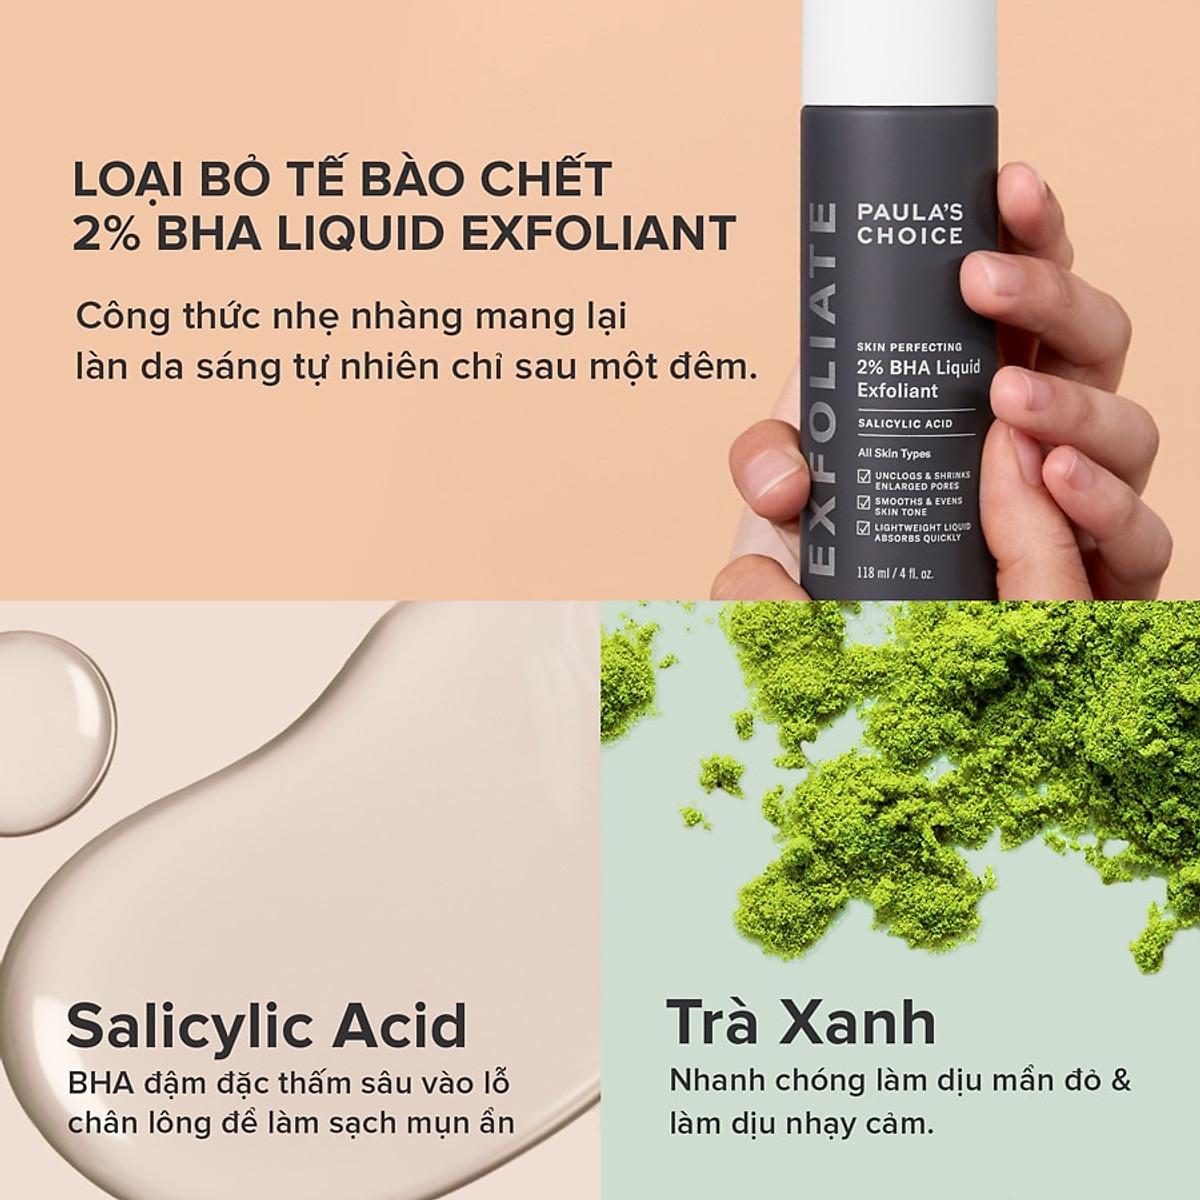 Dung Dịch Loại Bỏ Tế Bào Chết 2% BHA Paula's Choice Skin Perfecting 2% BHA  Liquid Exfoliant (118ml)   iStore Vietnam   Tiki